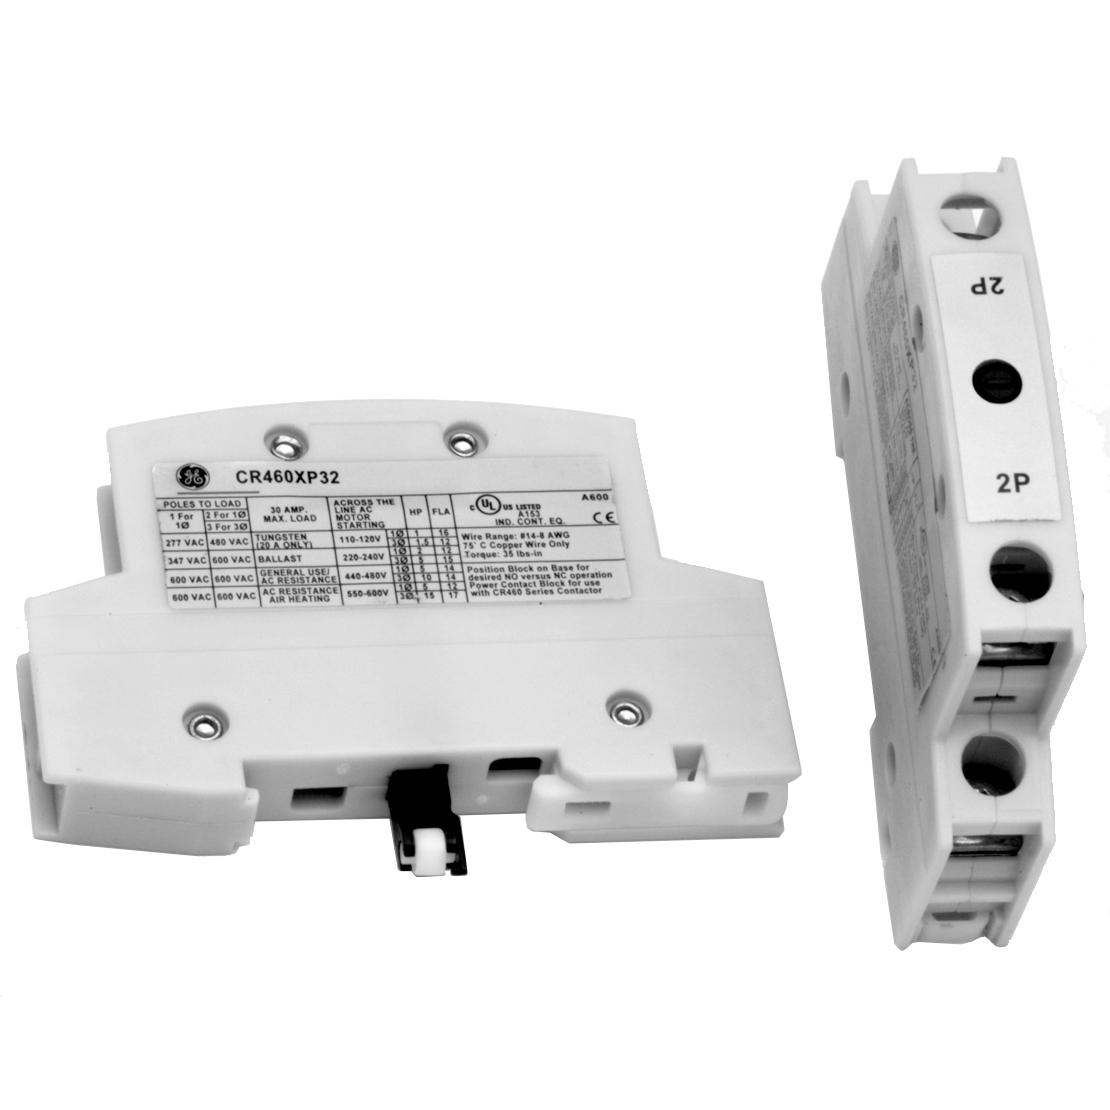 GE CR460XP32